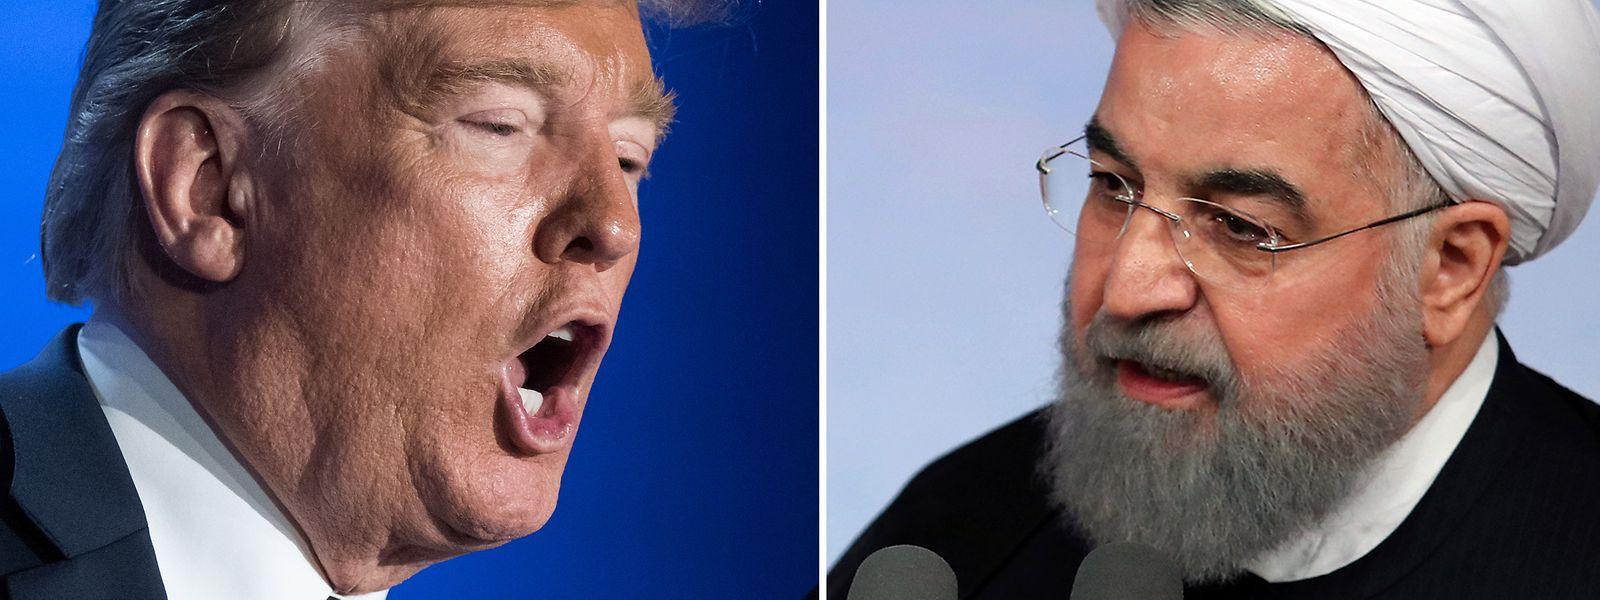 Donald Trump und Hassan Ruhani, Präsident des Iran.